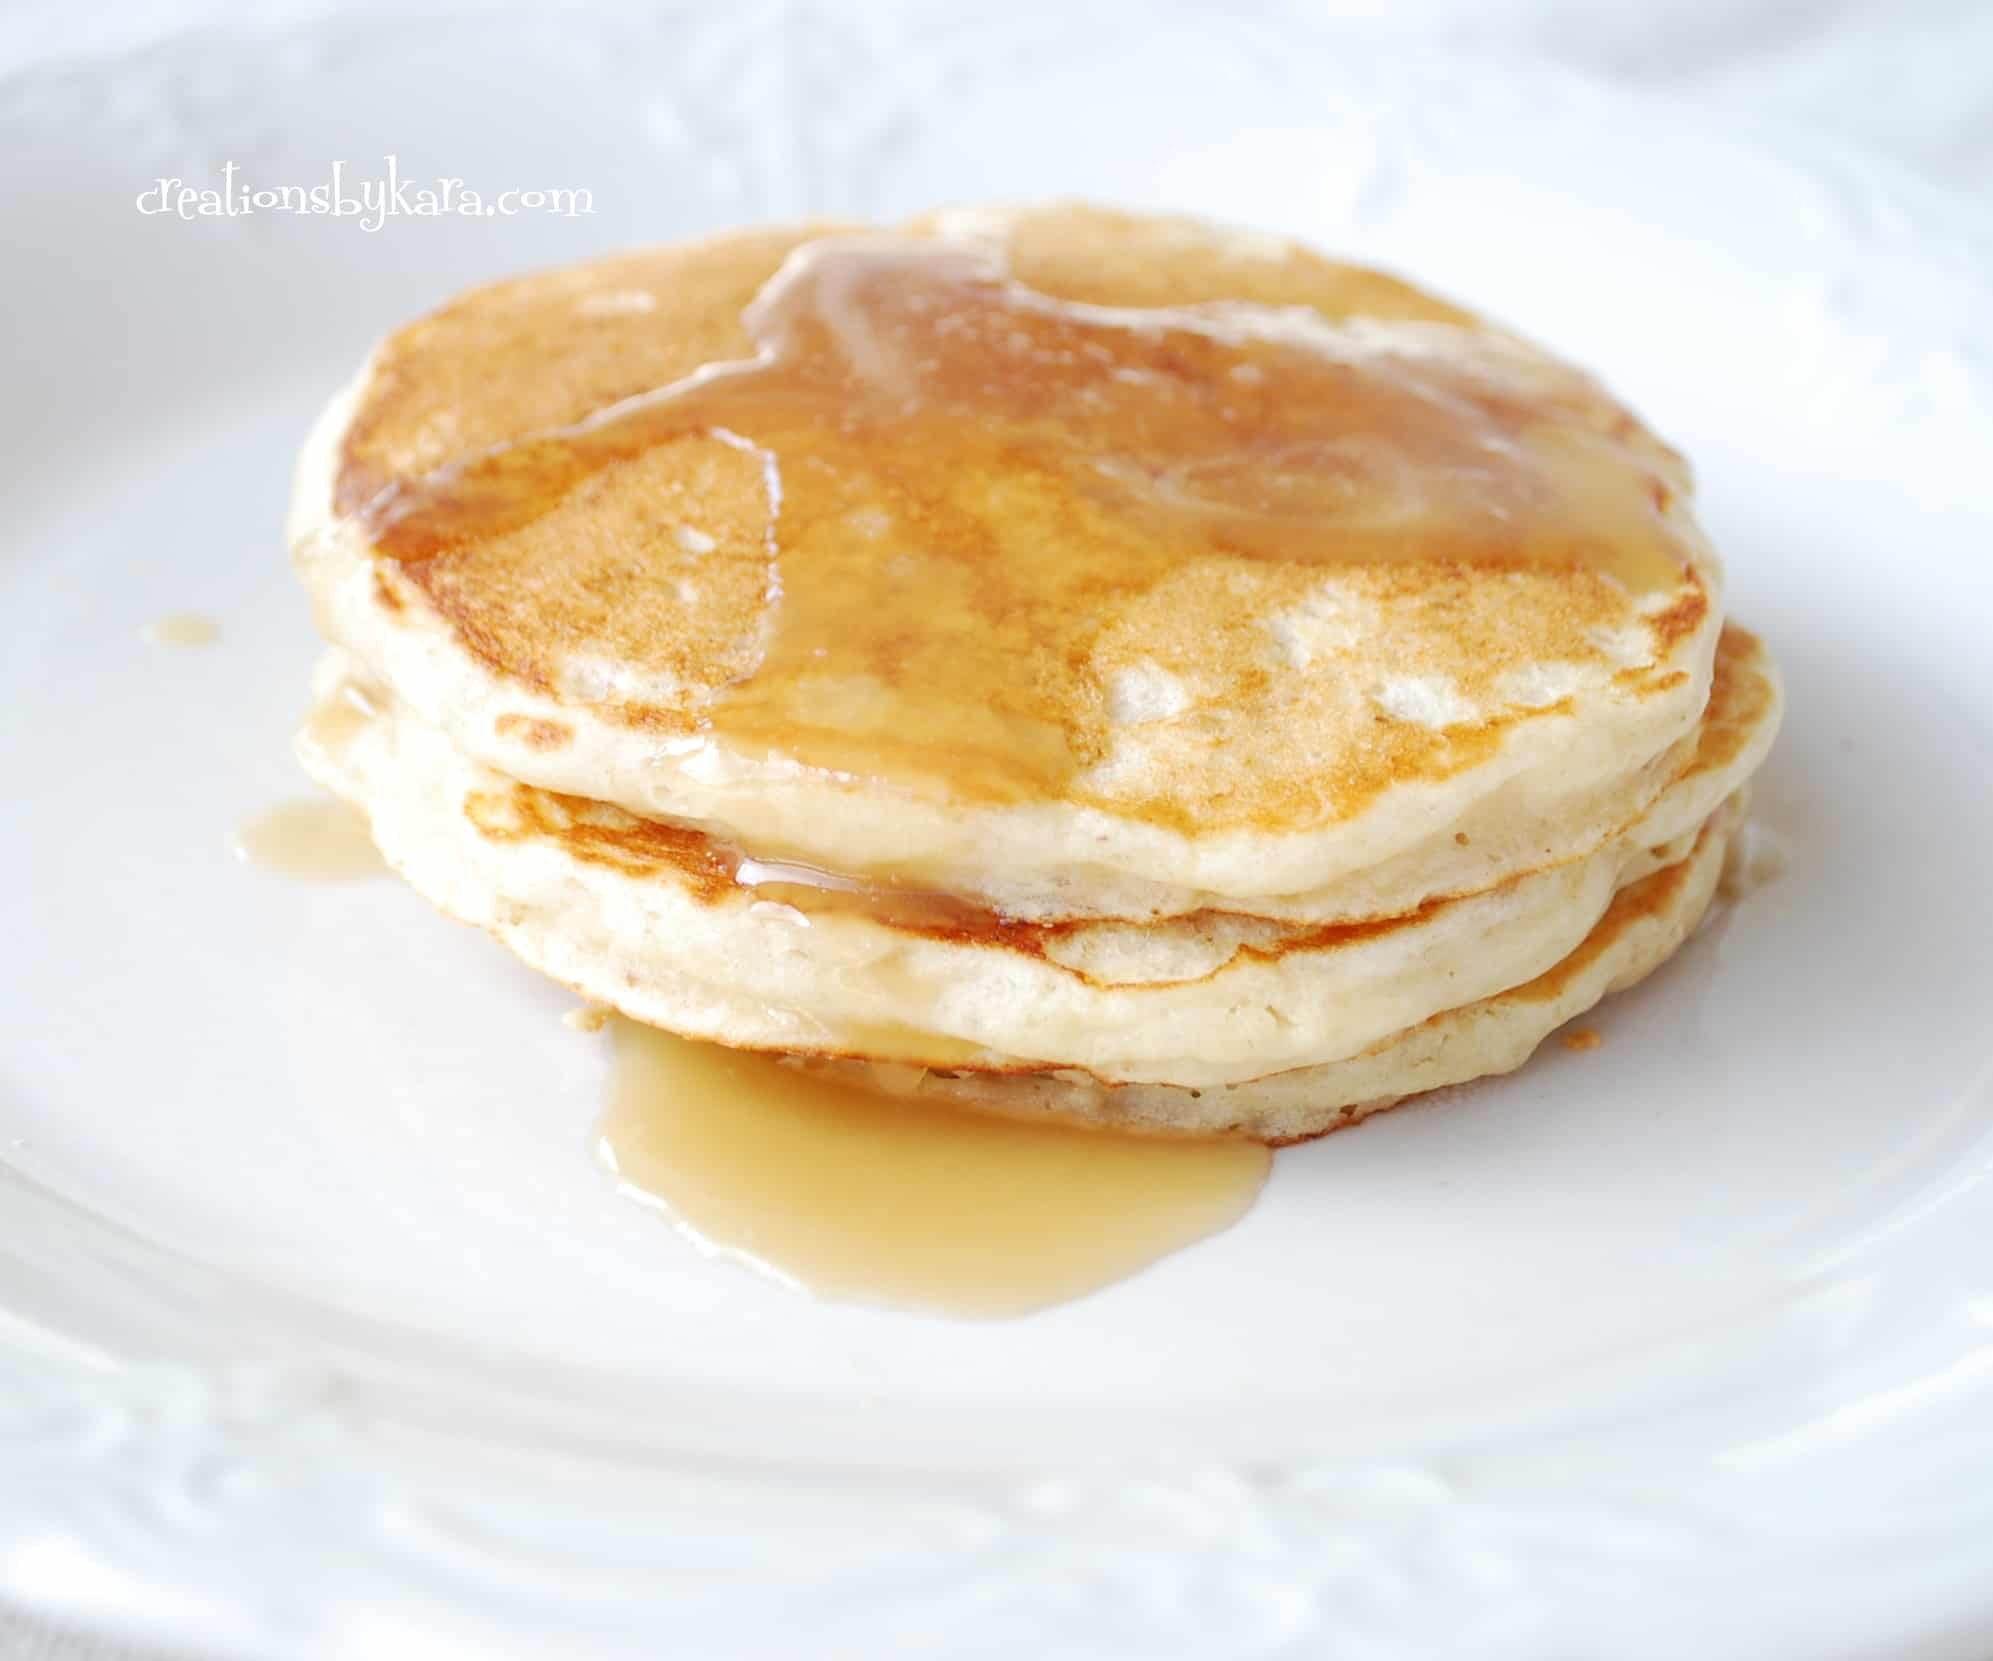 banana pecan pancakes 006 - Creations by Kara